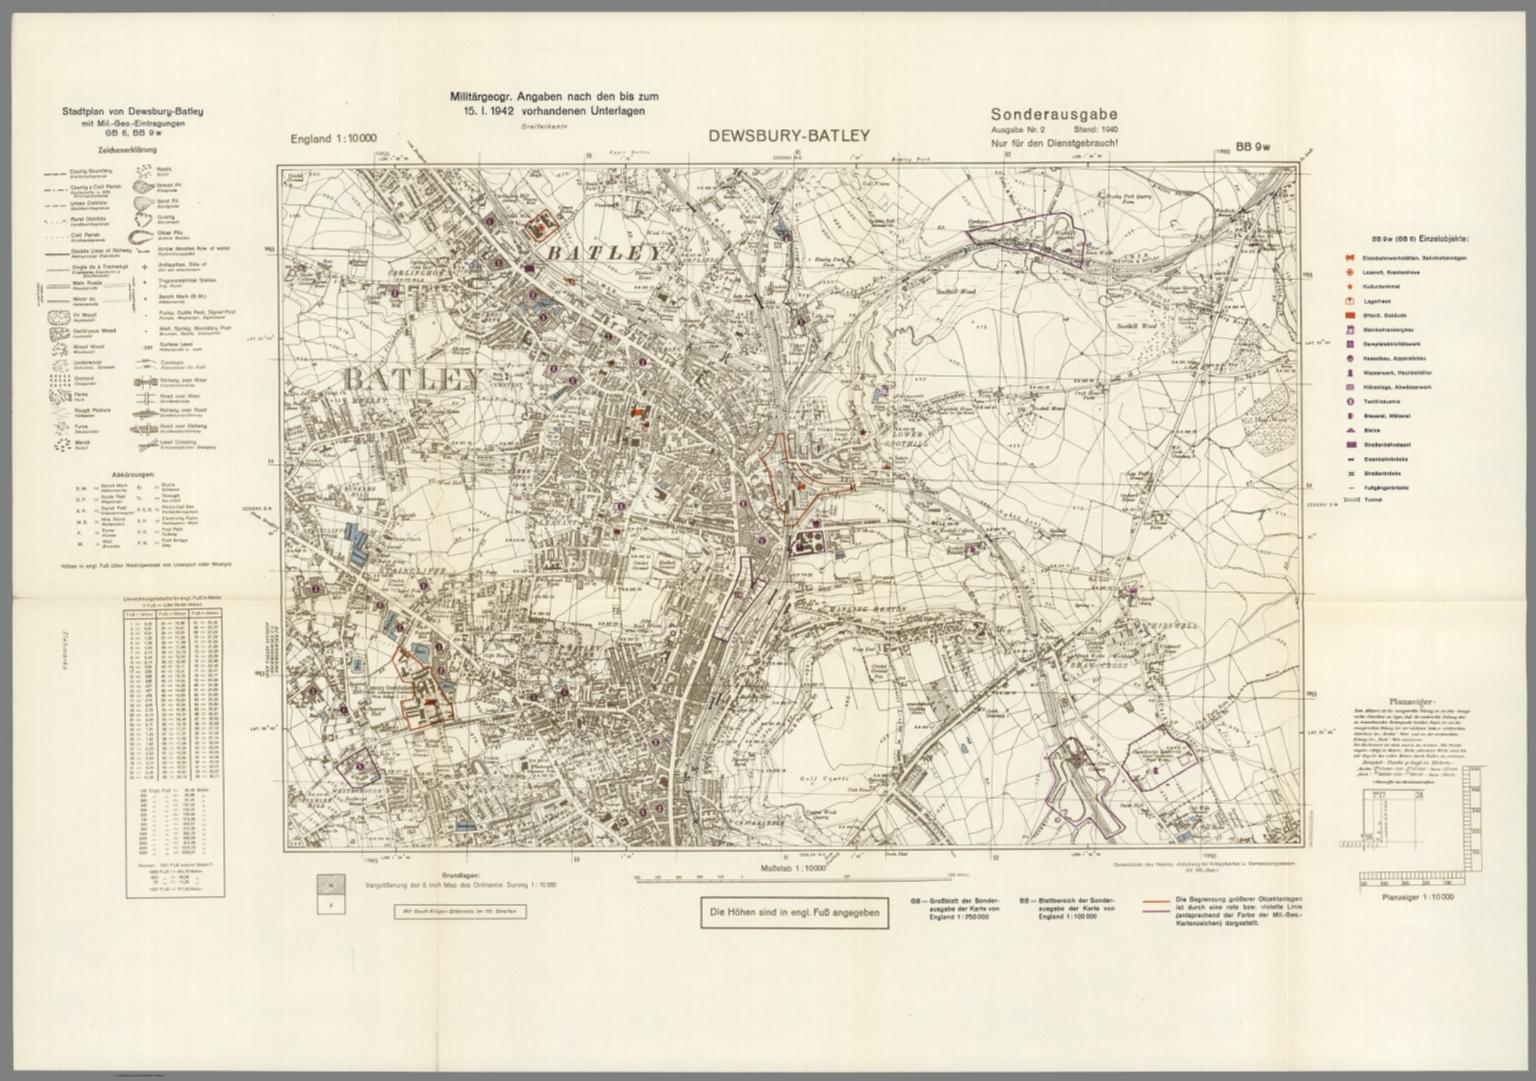 Street Map of DewsburyBatley England with MilitaryGeographic